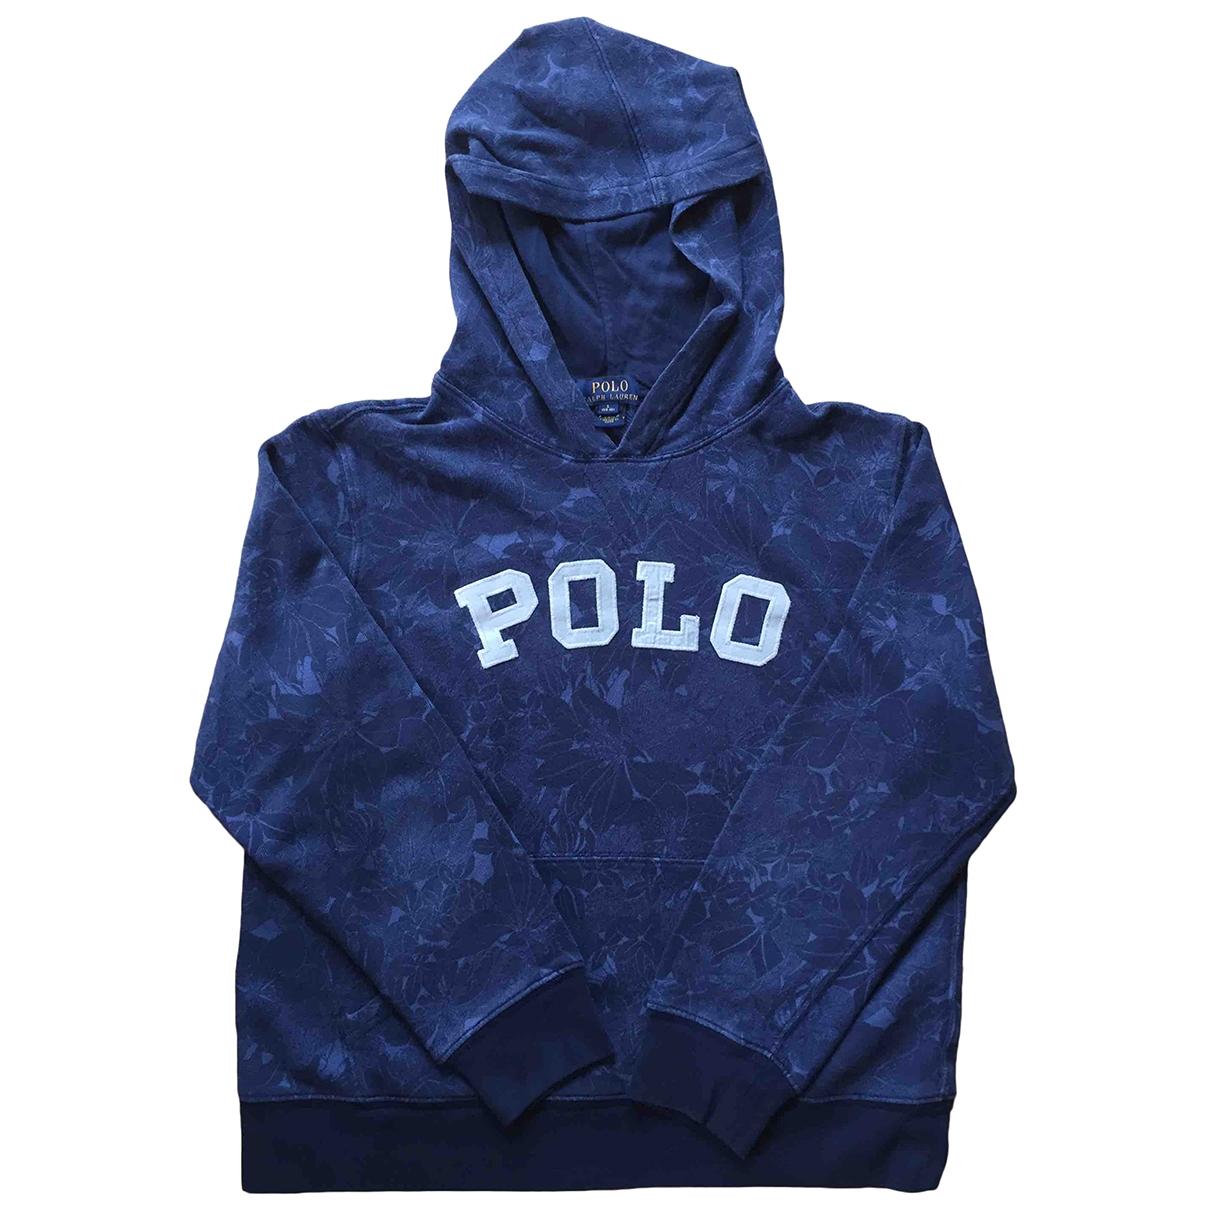 Polo Ralph Lauren \N Blue Cotton Knitwear for Kids 18 years - L FR